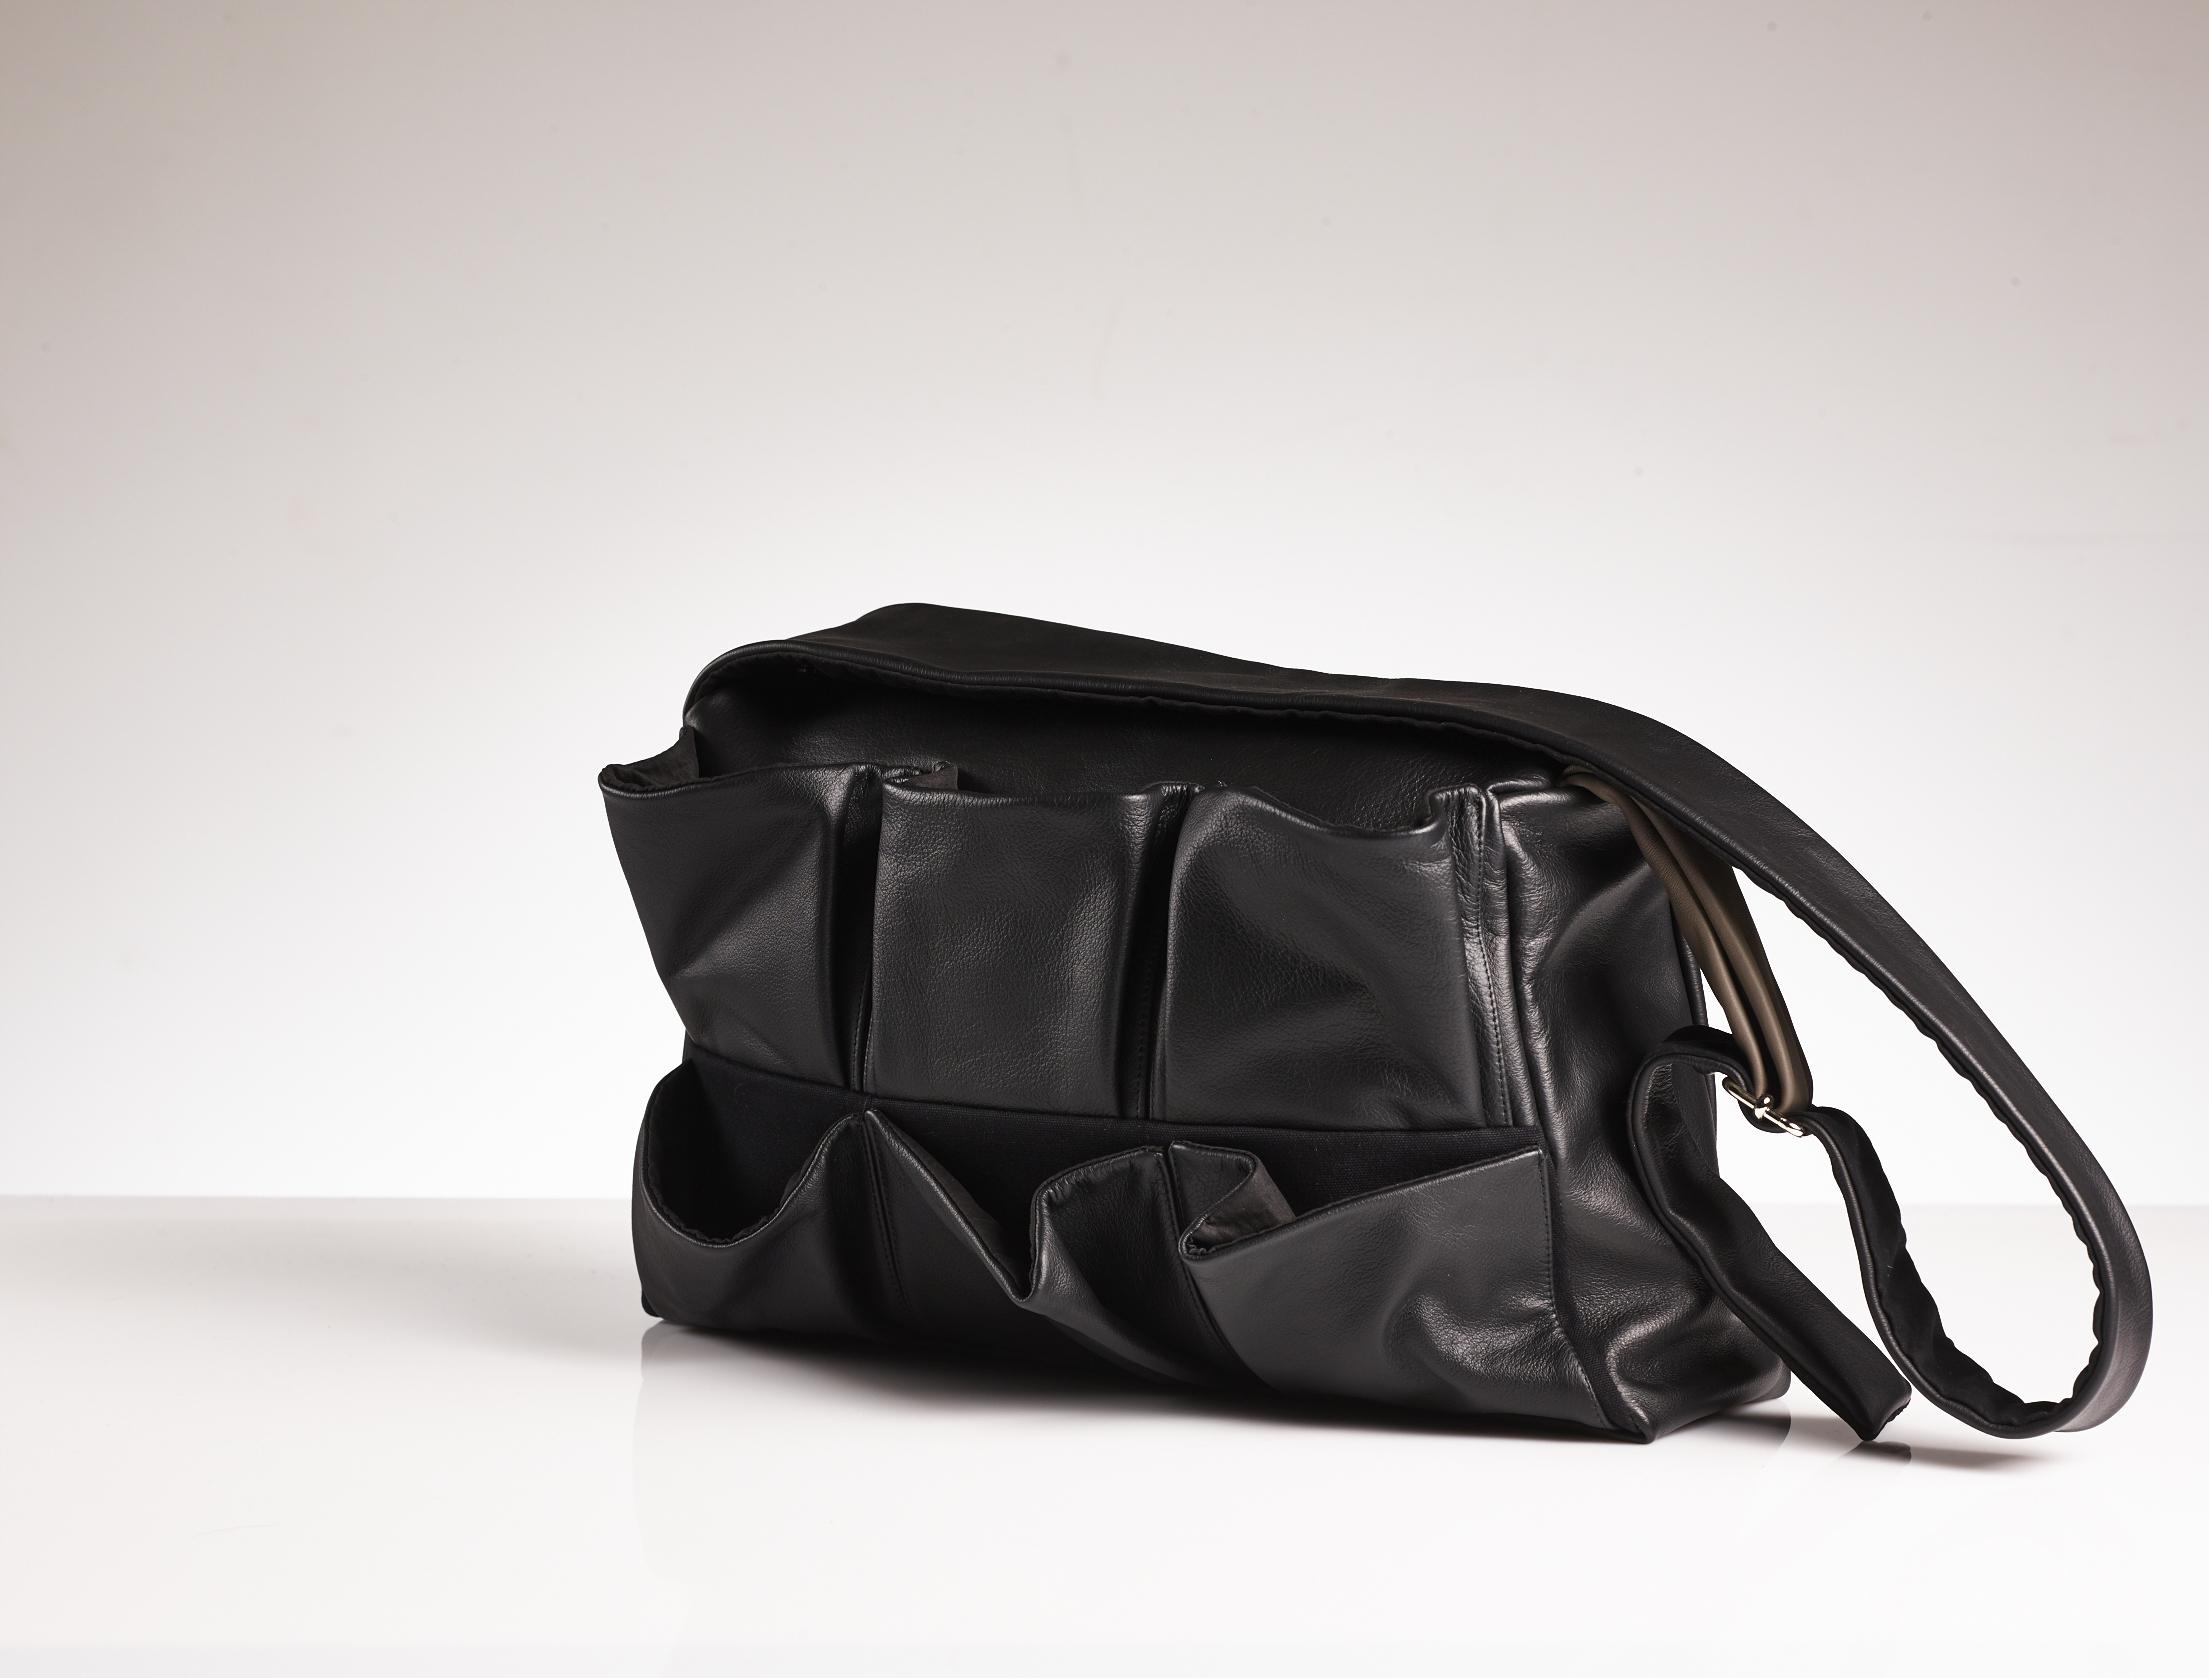 Strehlow handtasche_25989.jpg